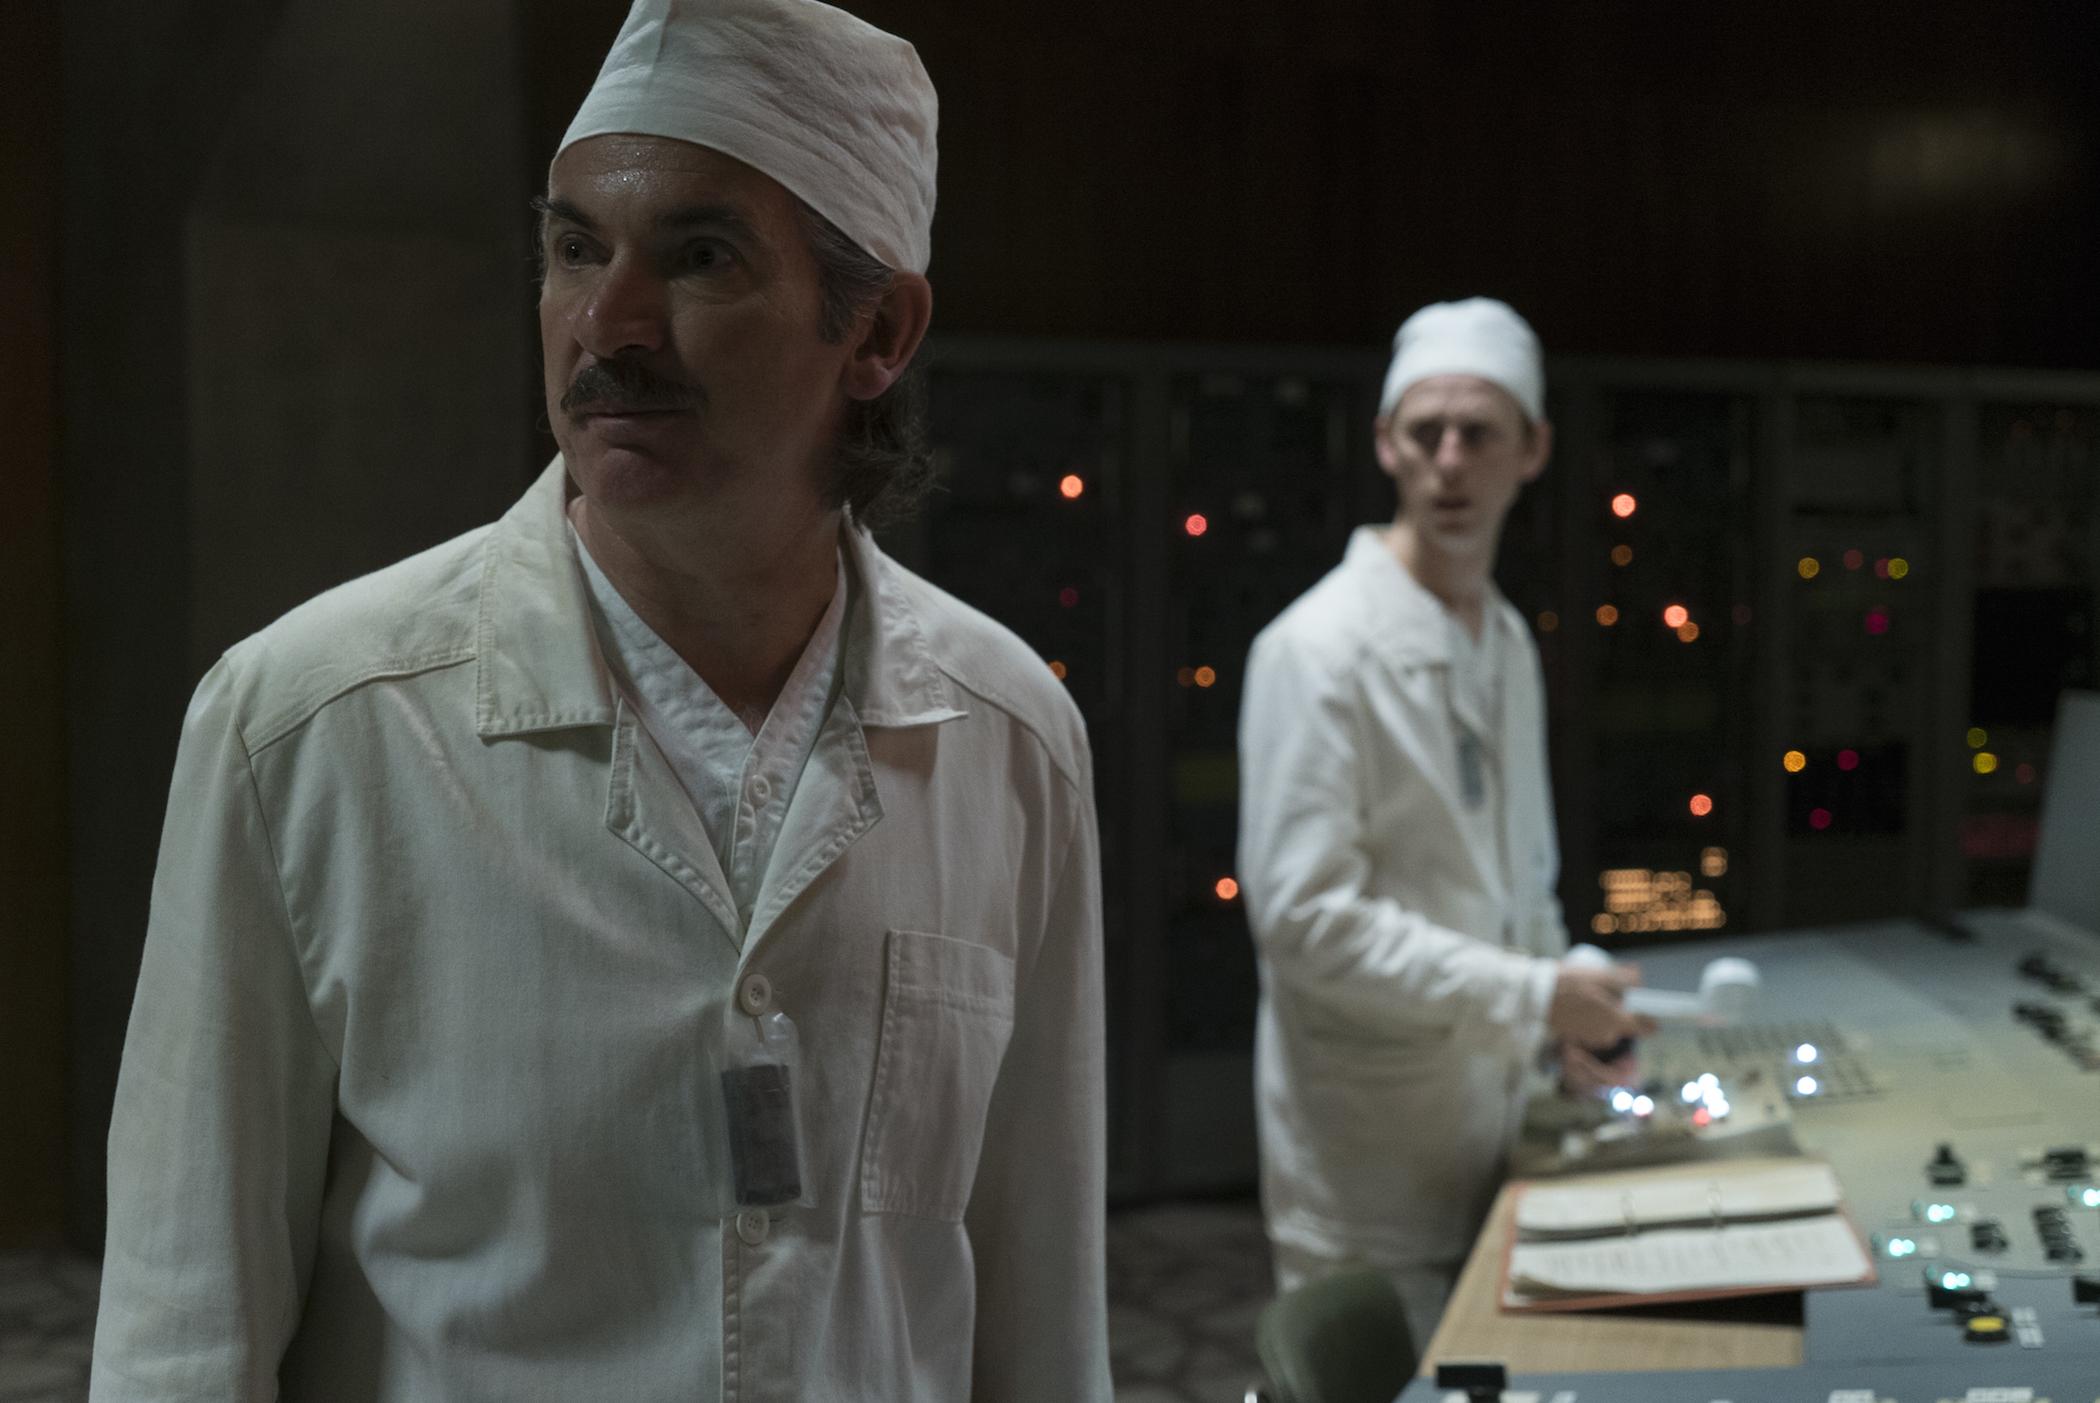 Paul Ritter (left) as Anatoly Dyatlov and Robert Emma (right) as Leonid Toptunov.